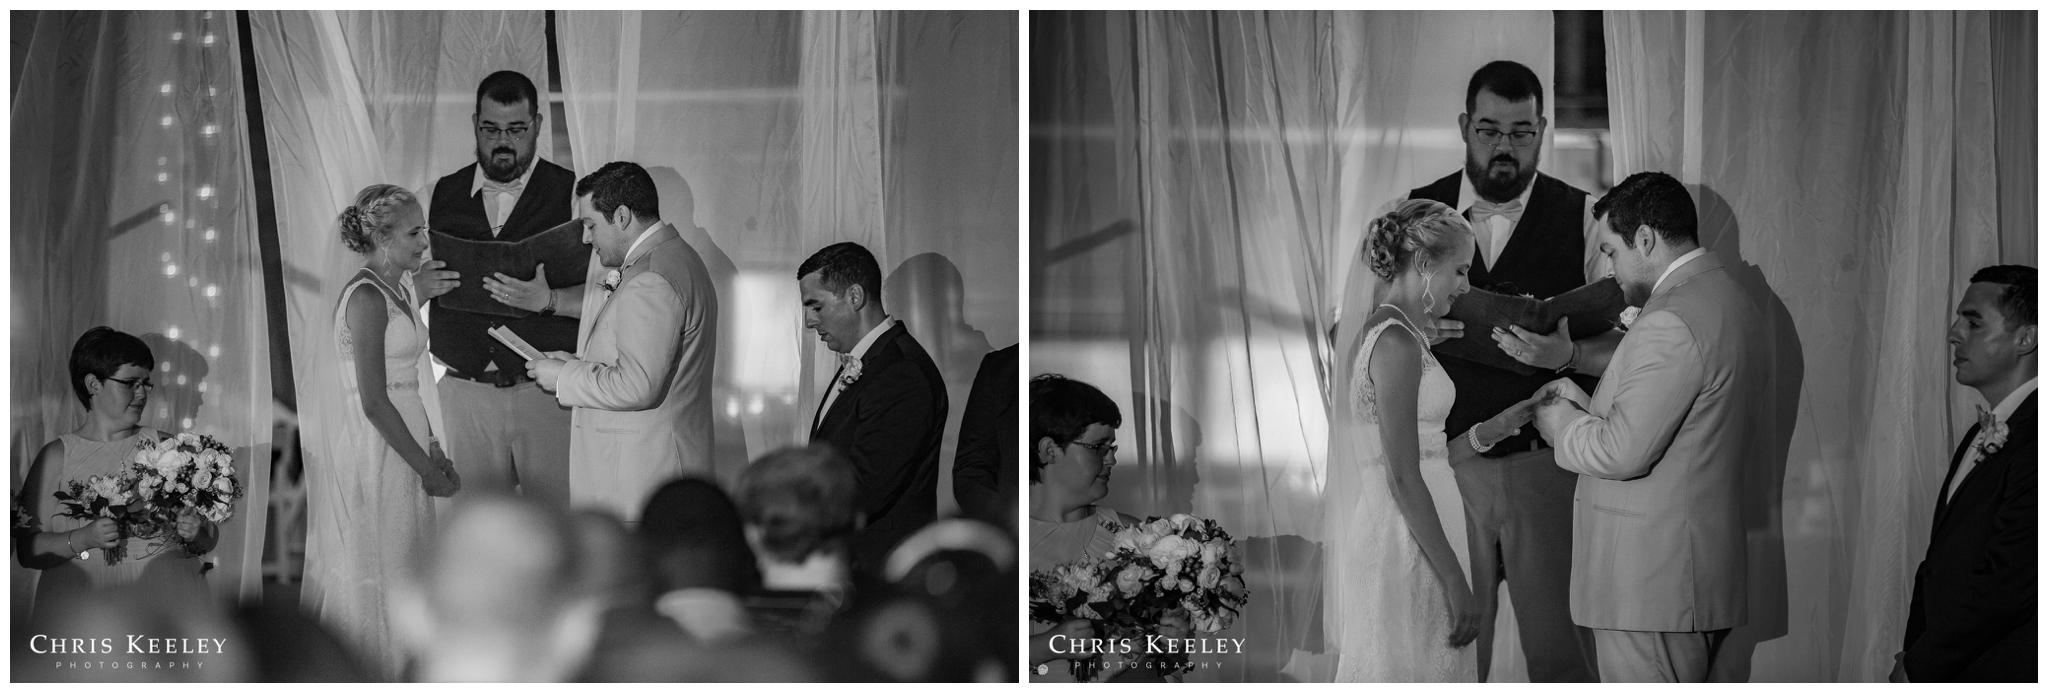 indoor-wedding-ceremony-ragged-mountain.jpg